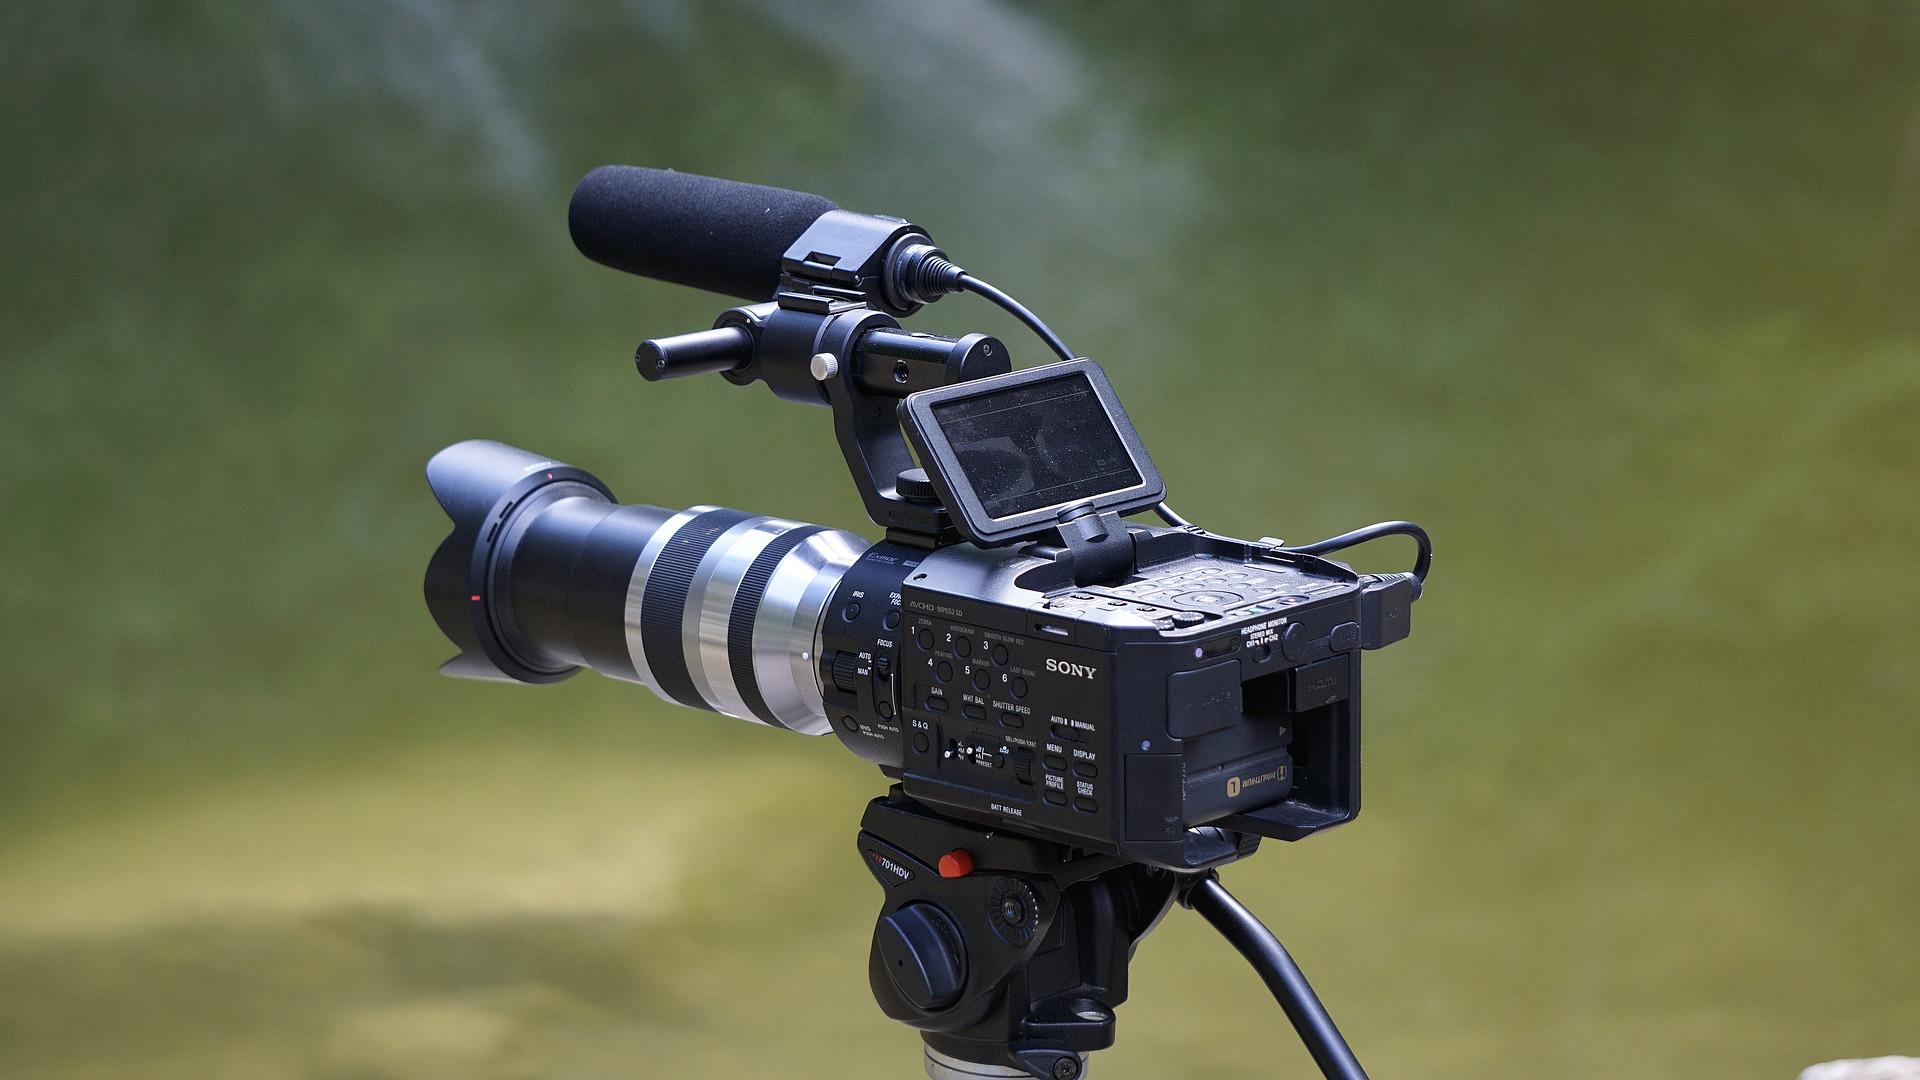 V Amsterdami prezentuvaly videokameru, jaka zapysuje mynule